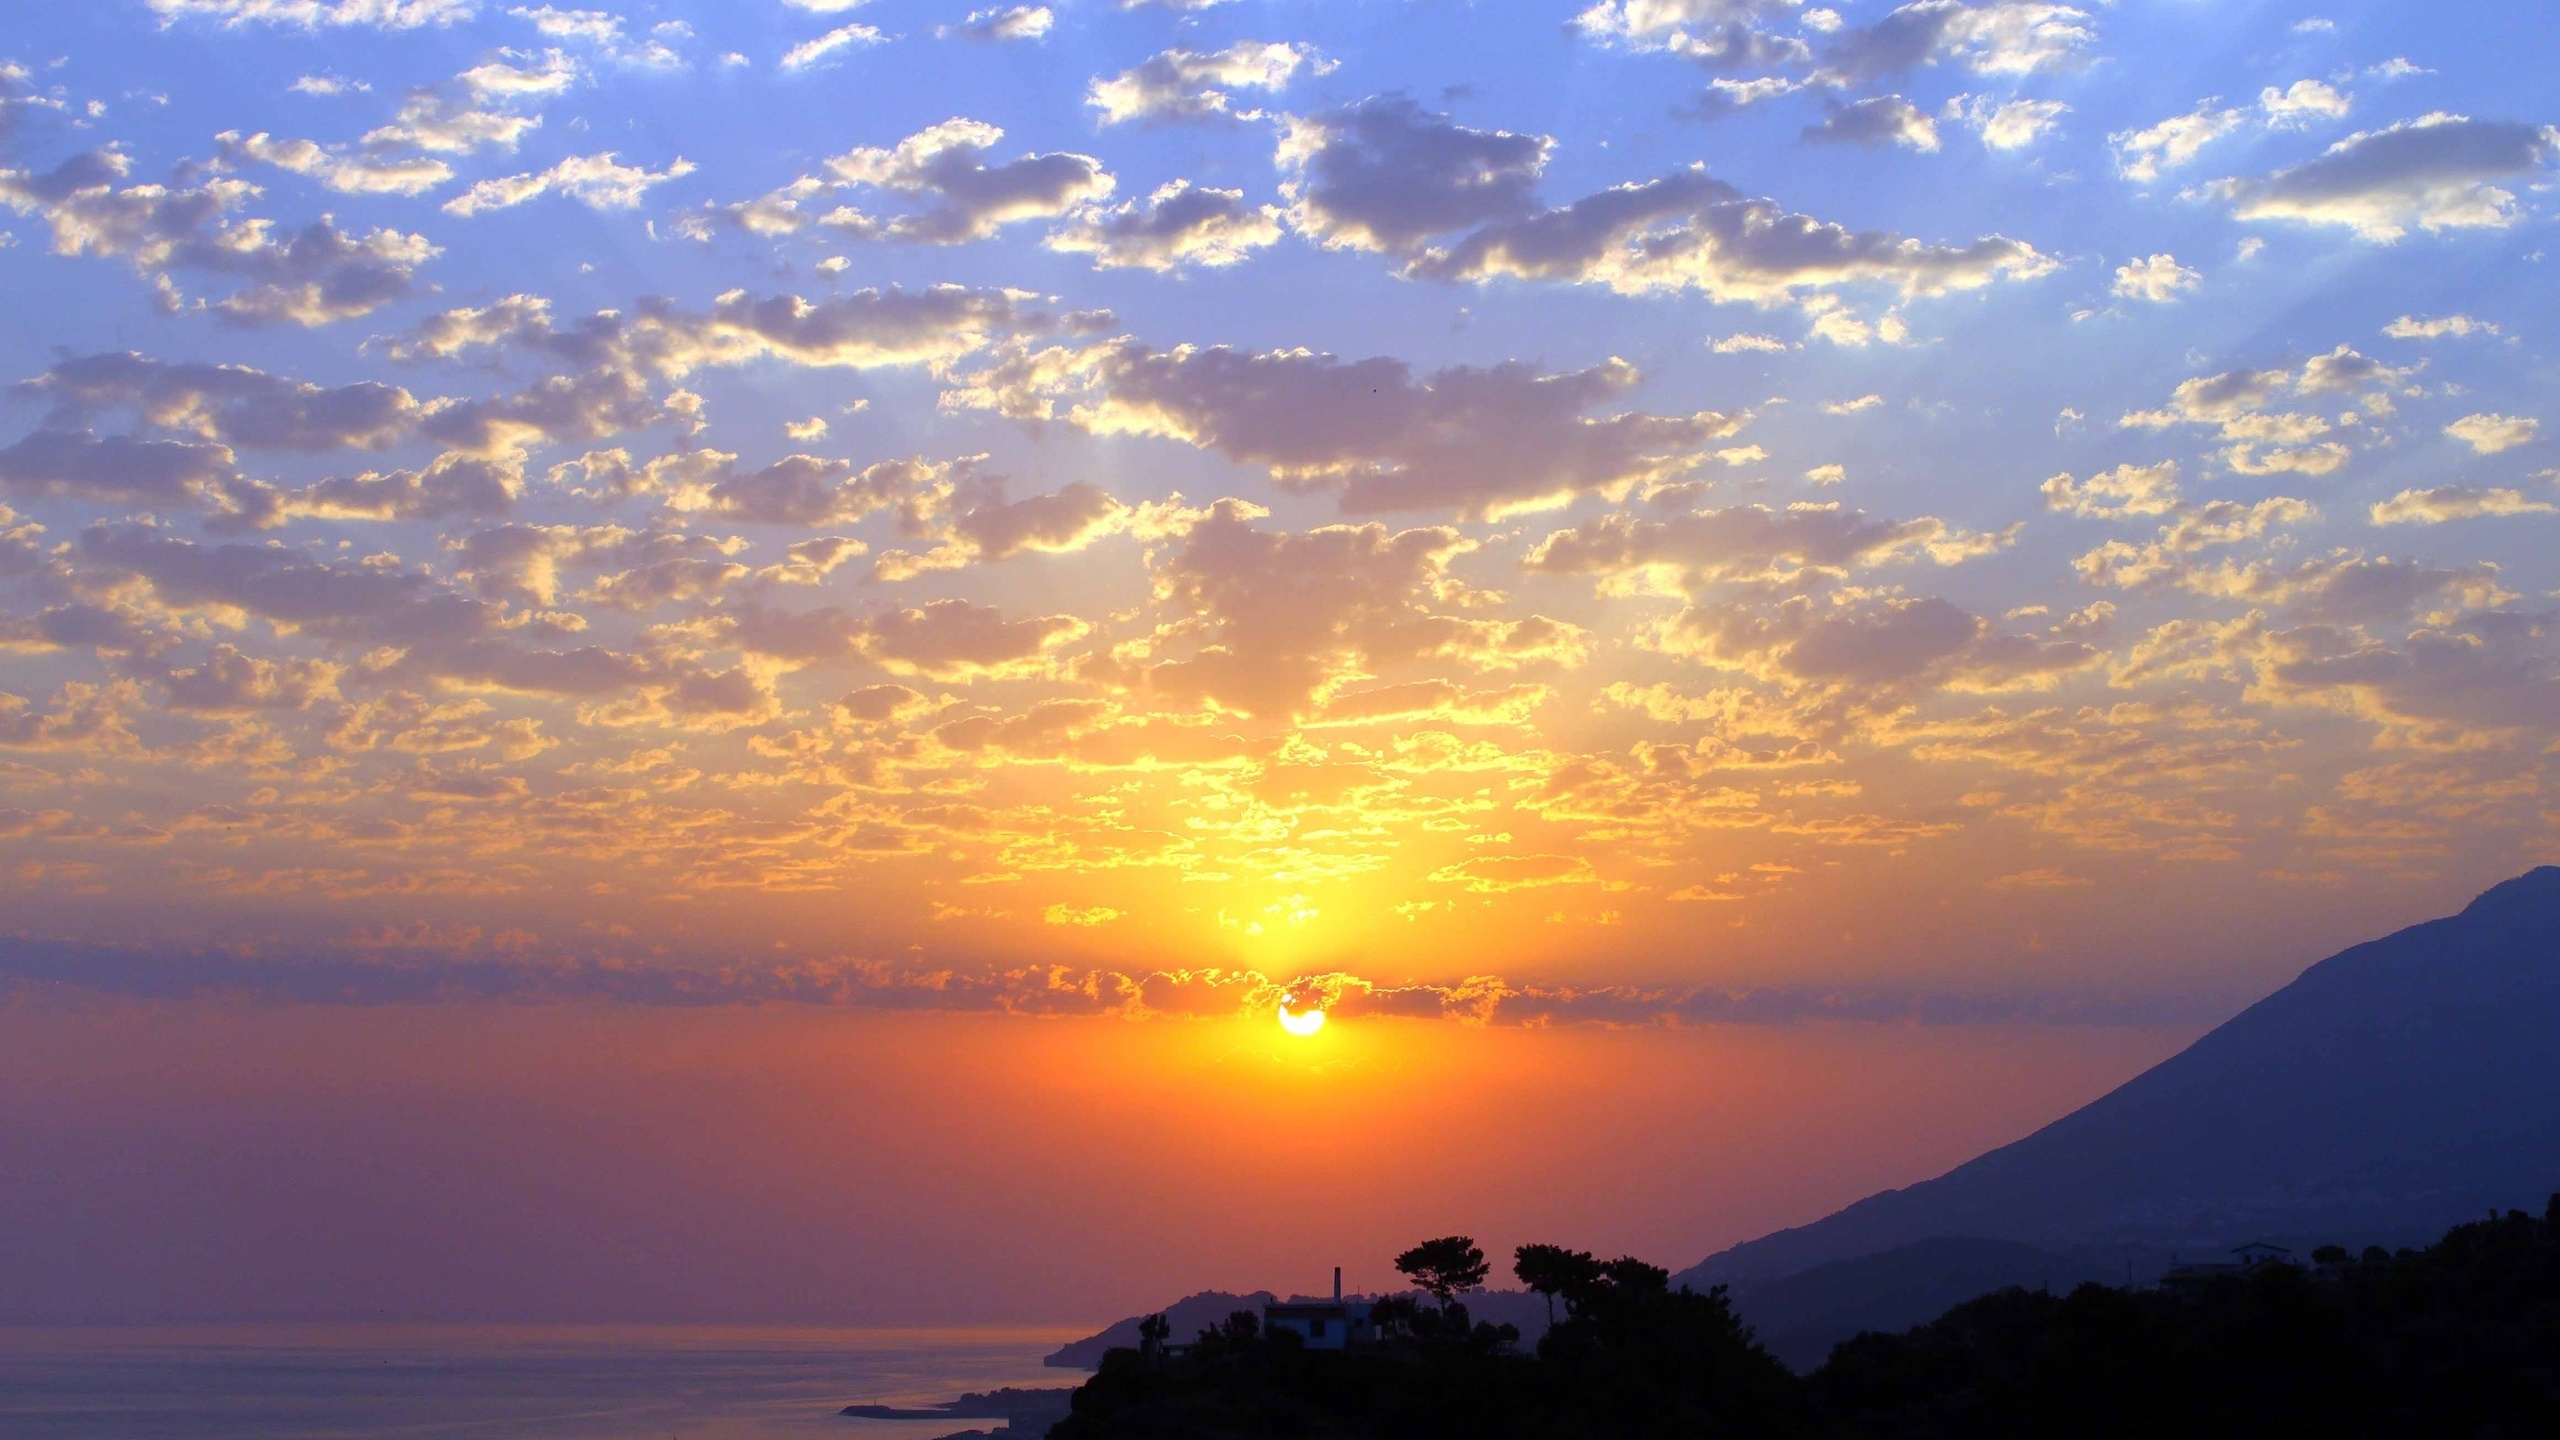 закат, горы, океан, облака